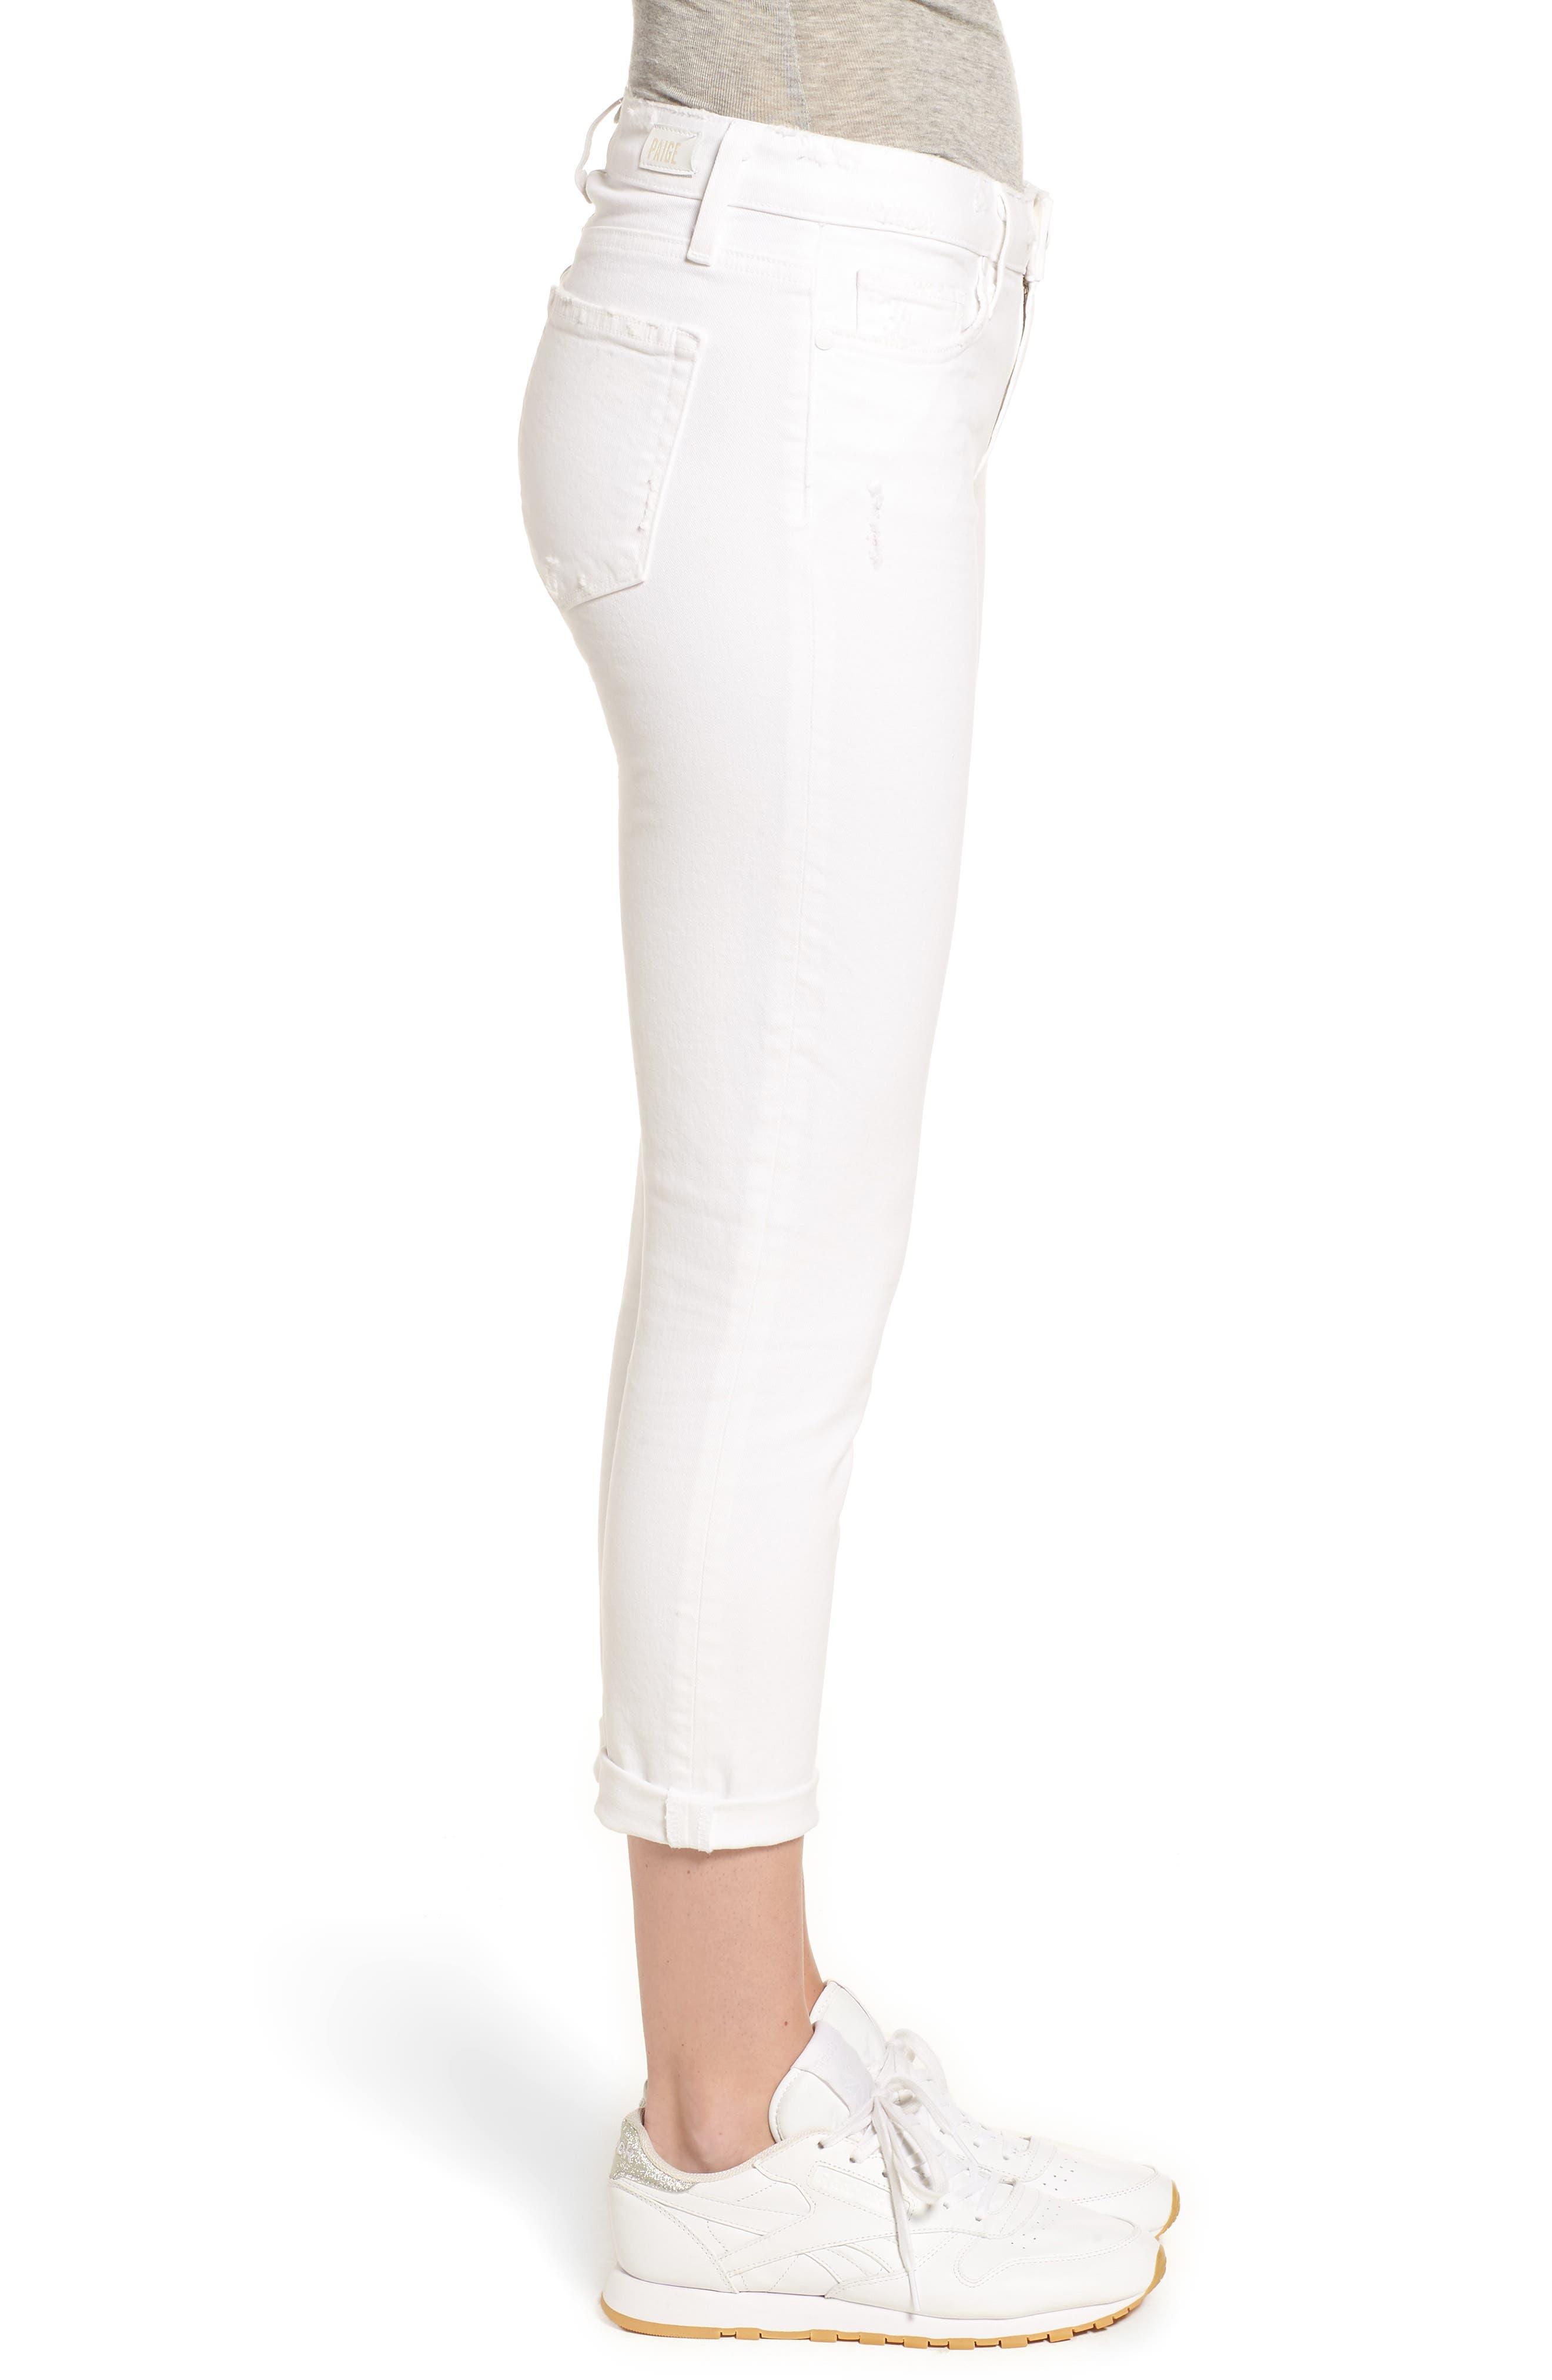 PAIGE, Skyline Raw Hem Crop Skinny Jeans, Alternate thumbnail 4, color, LIVED IN CRISP WHITE